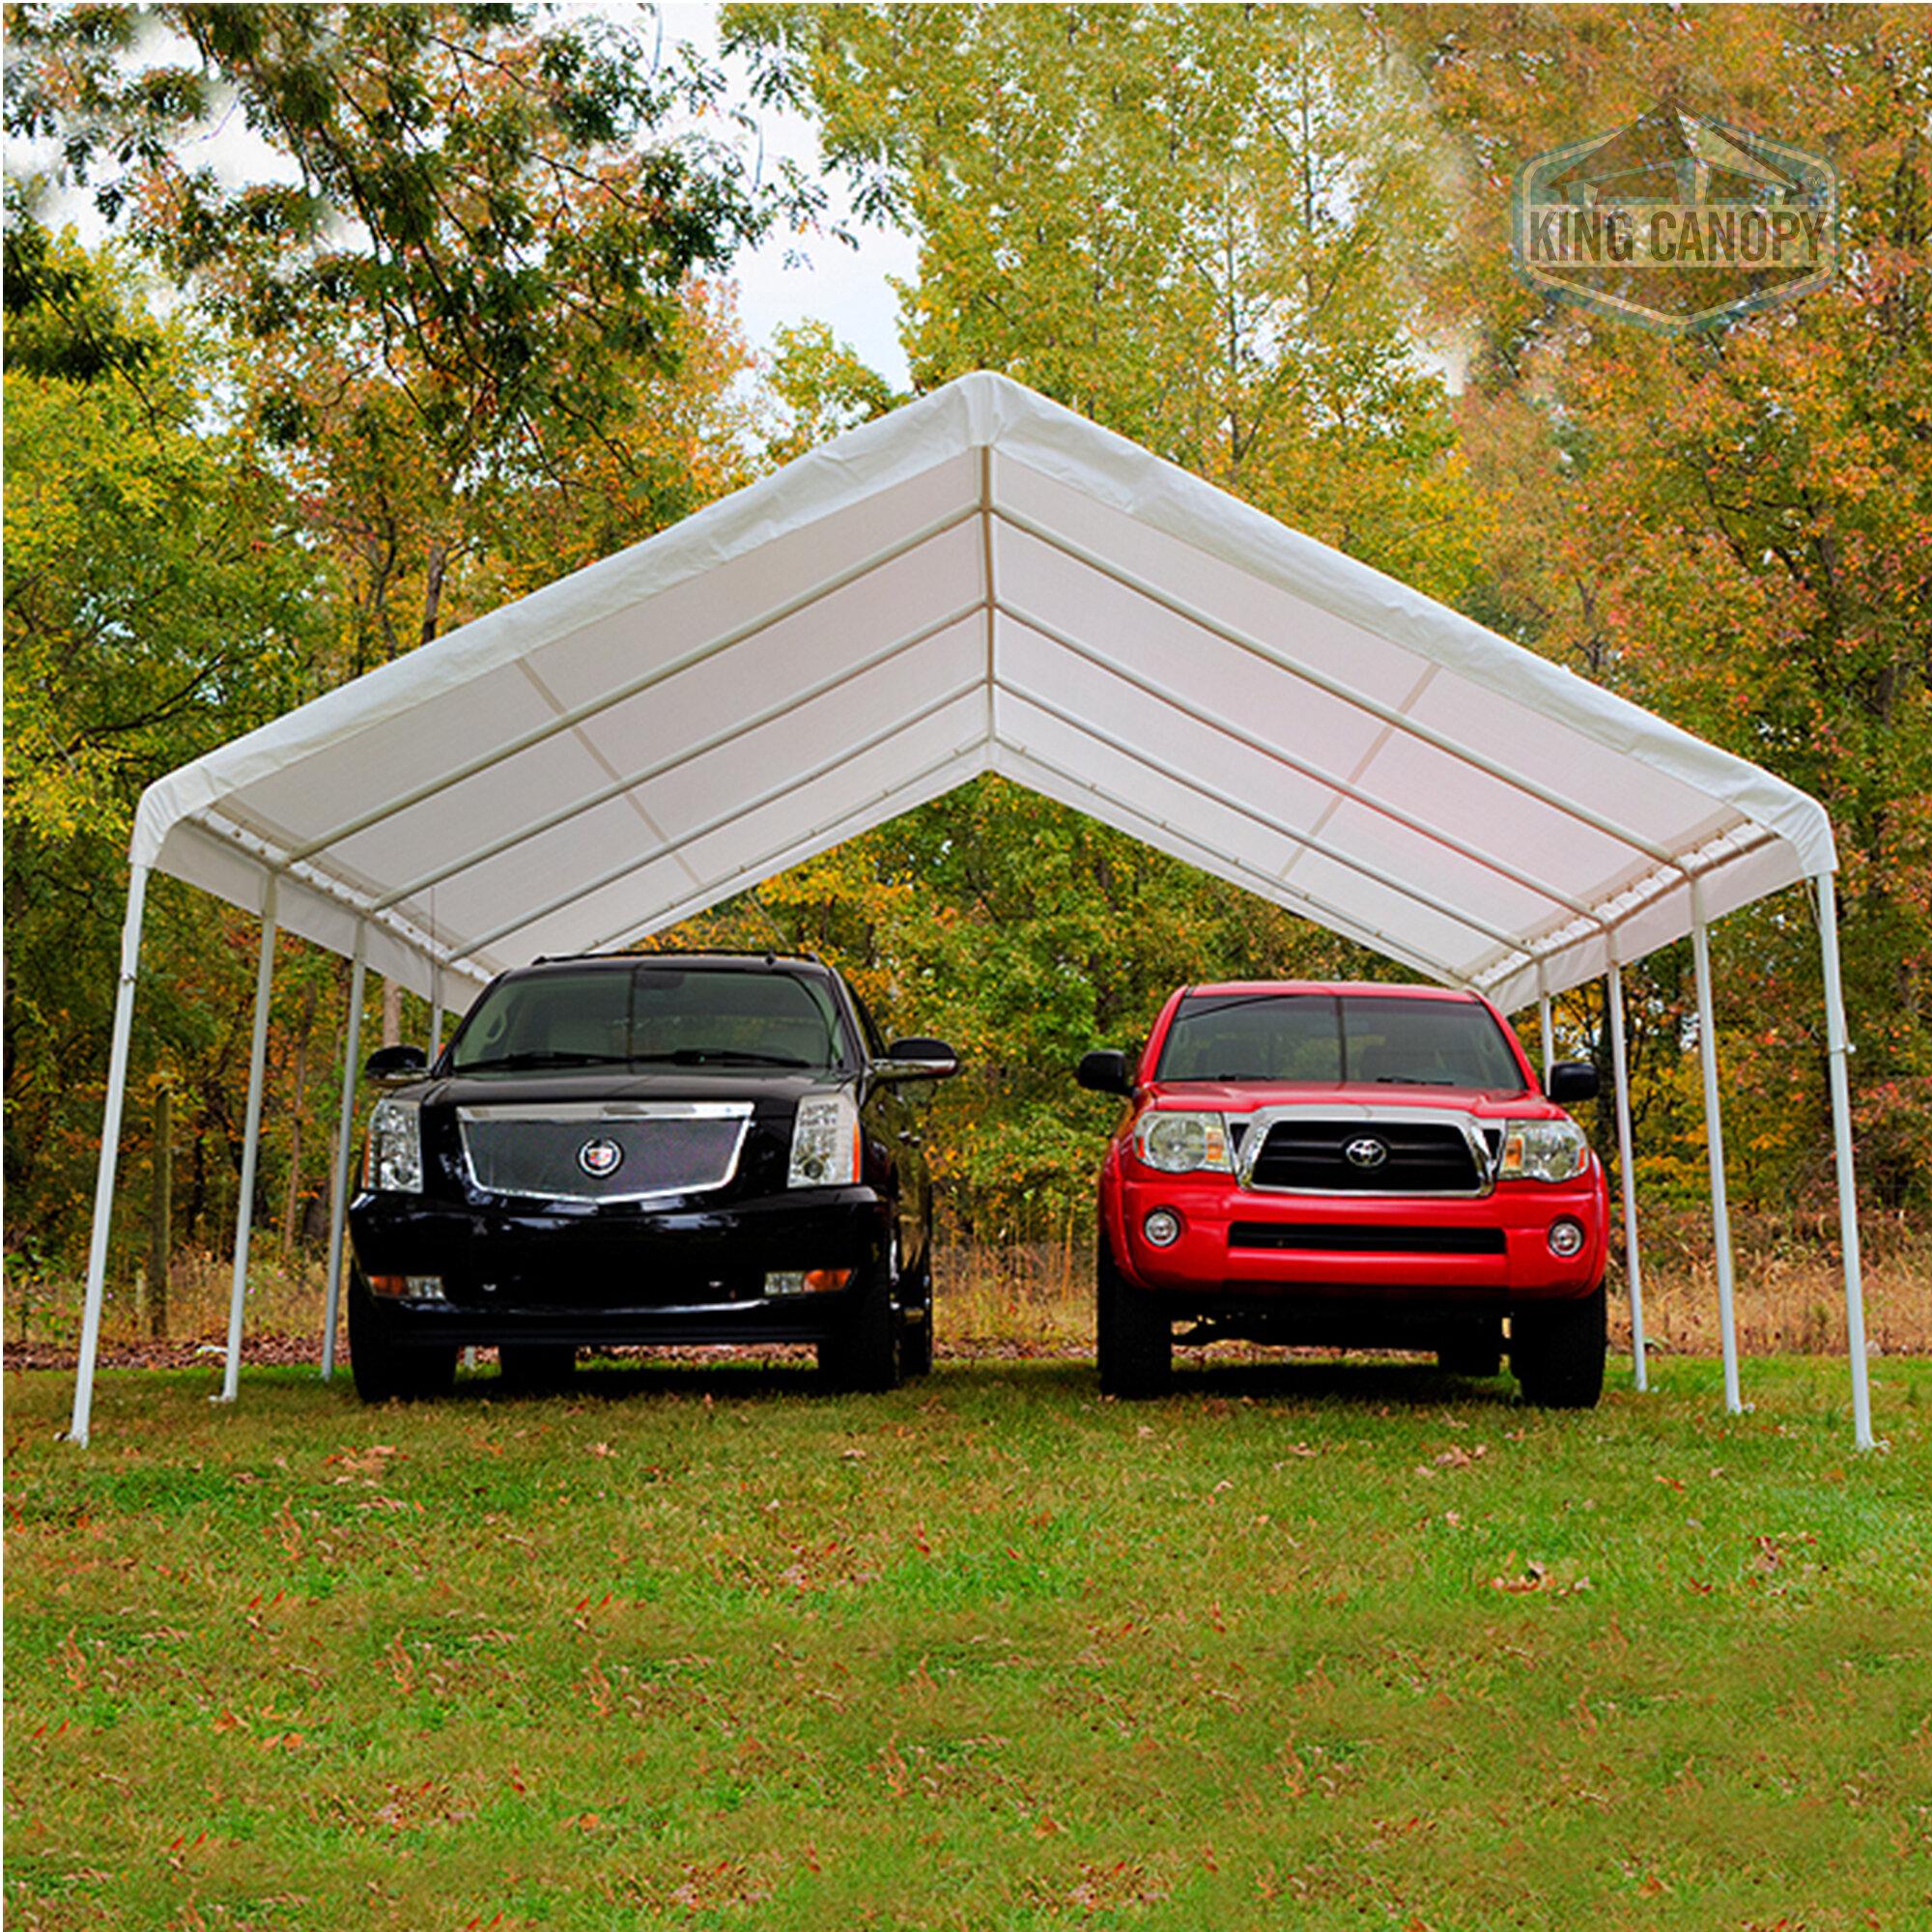 King Canopy Hercules 18 Ft  x 27 Ft  Canopy & Reviews | Wayfair